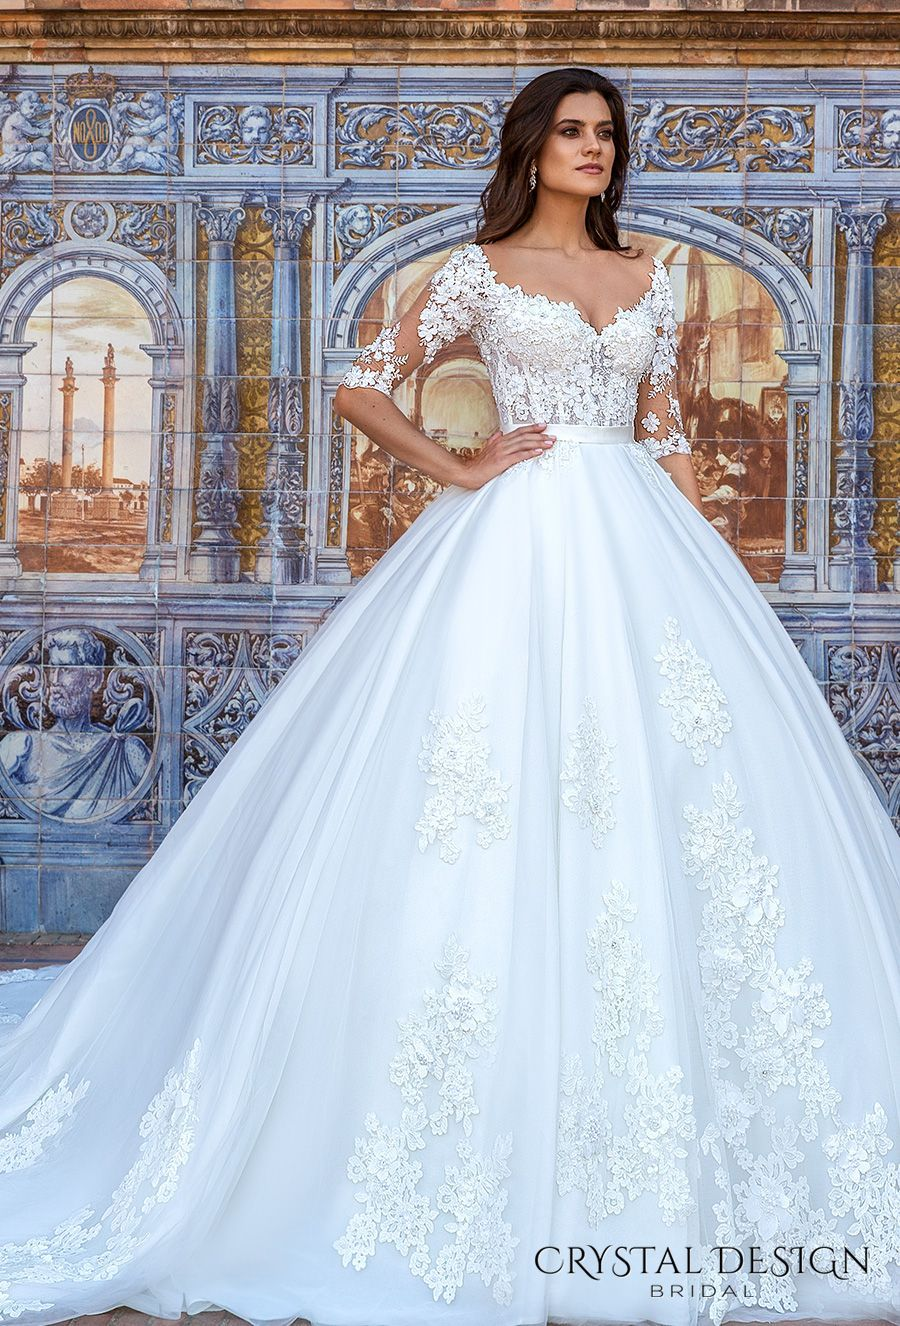 Crystal design bridal half sleeves sweetheart neckline heavily